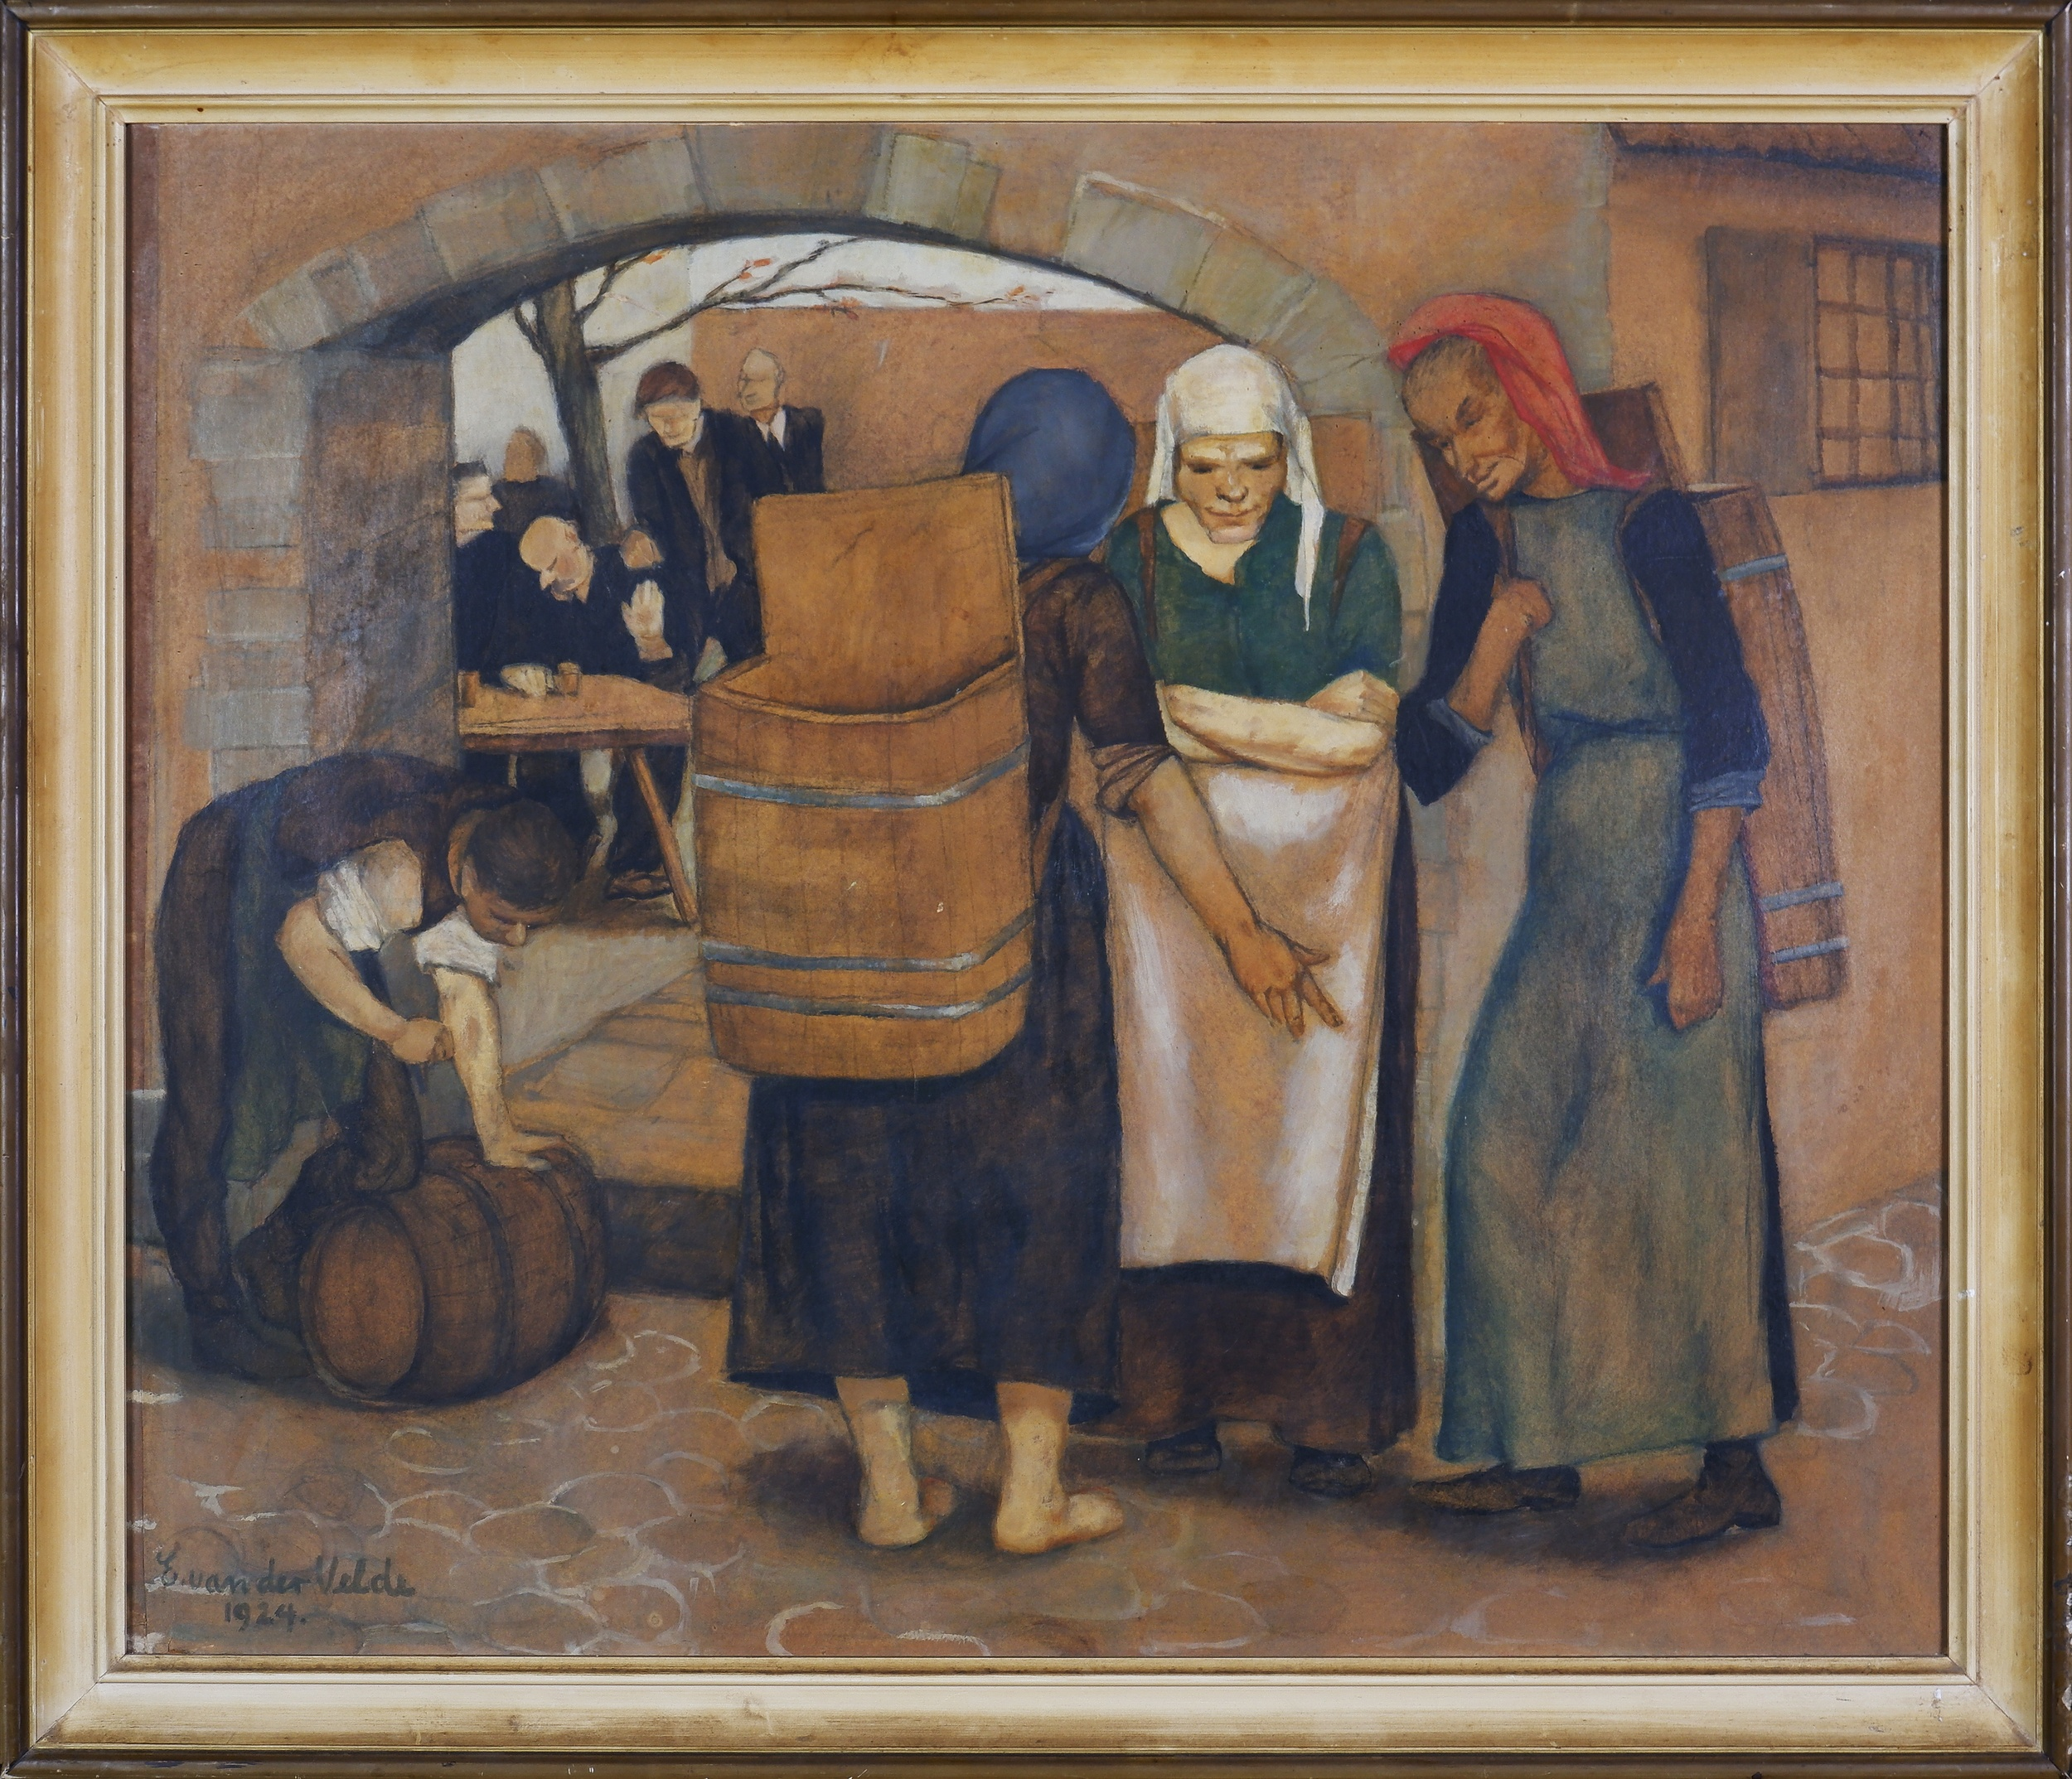 'E. van der Velde (20th Century), Untitled (Marketplace Scene) 1924, Oil and Pencil on Paper on Board, 55 x 65 cm'